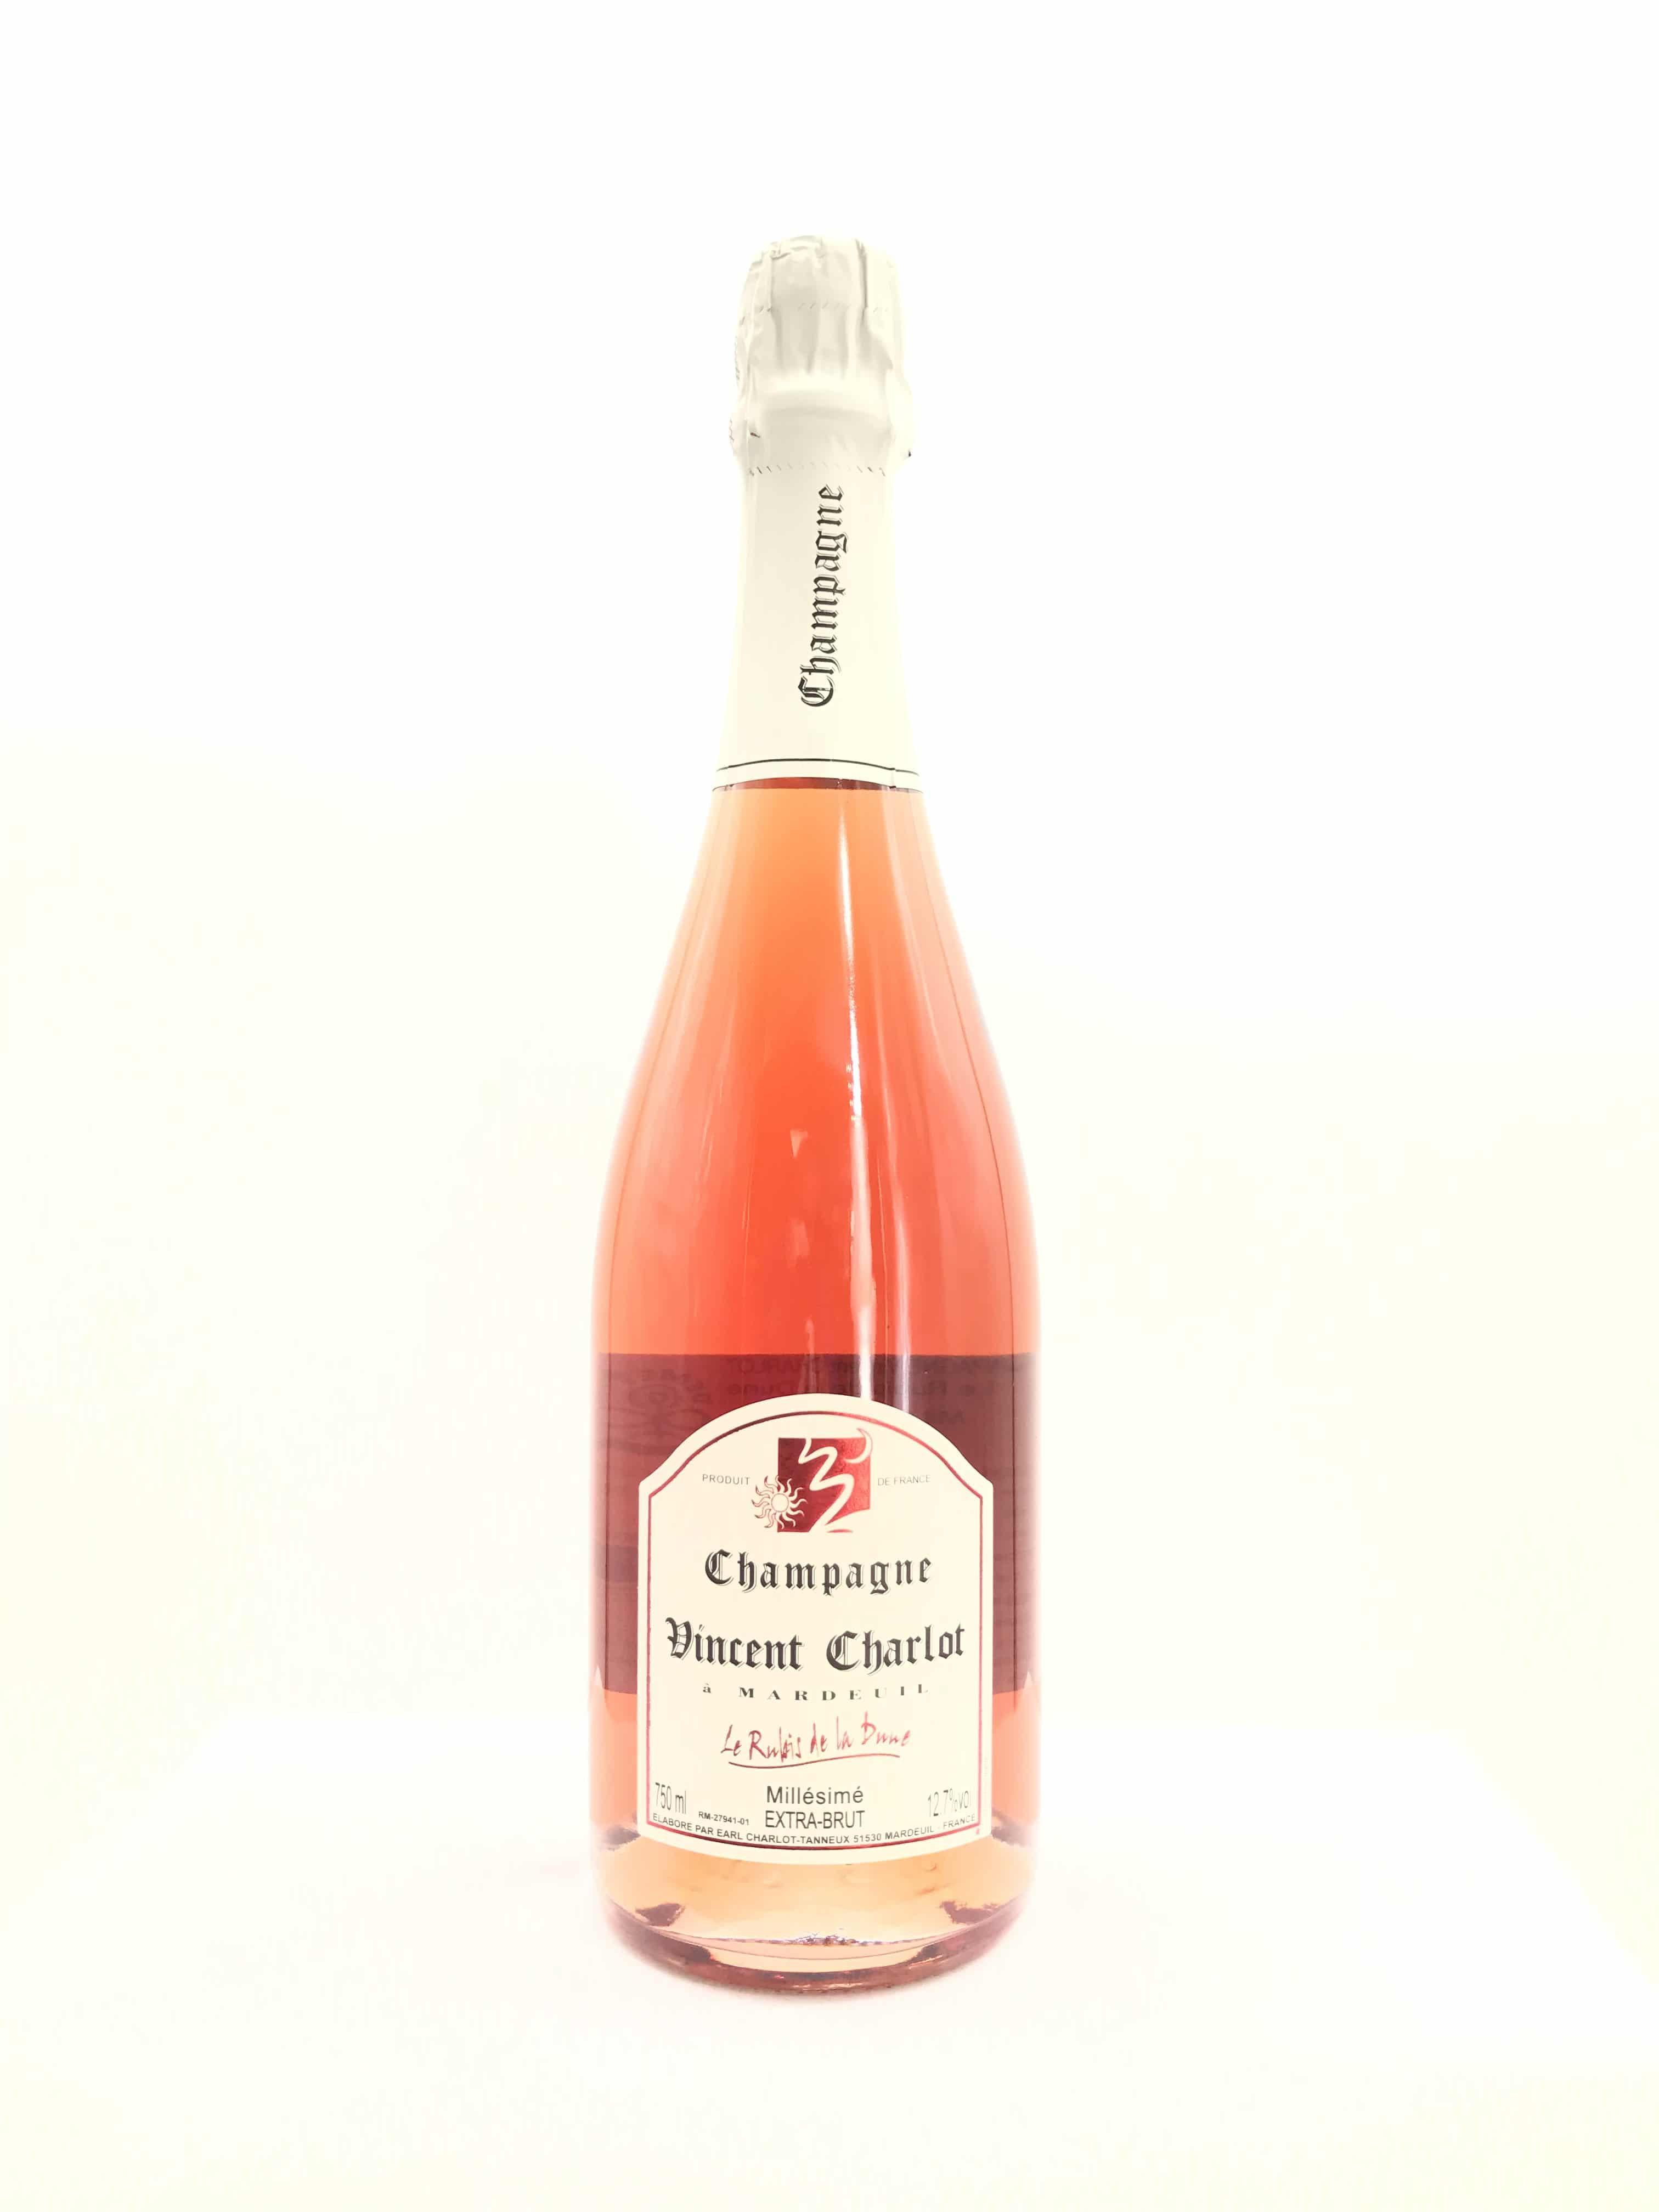 Champagne Charlot Tanneux Rose Rubis de la Dune Millesime